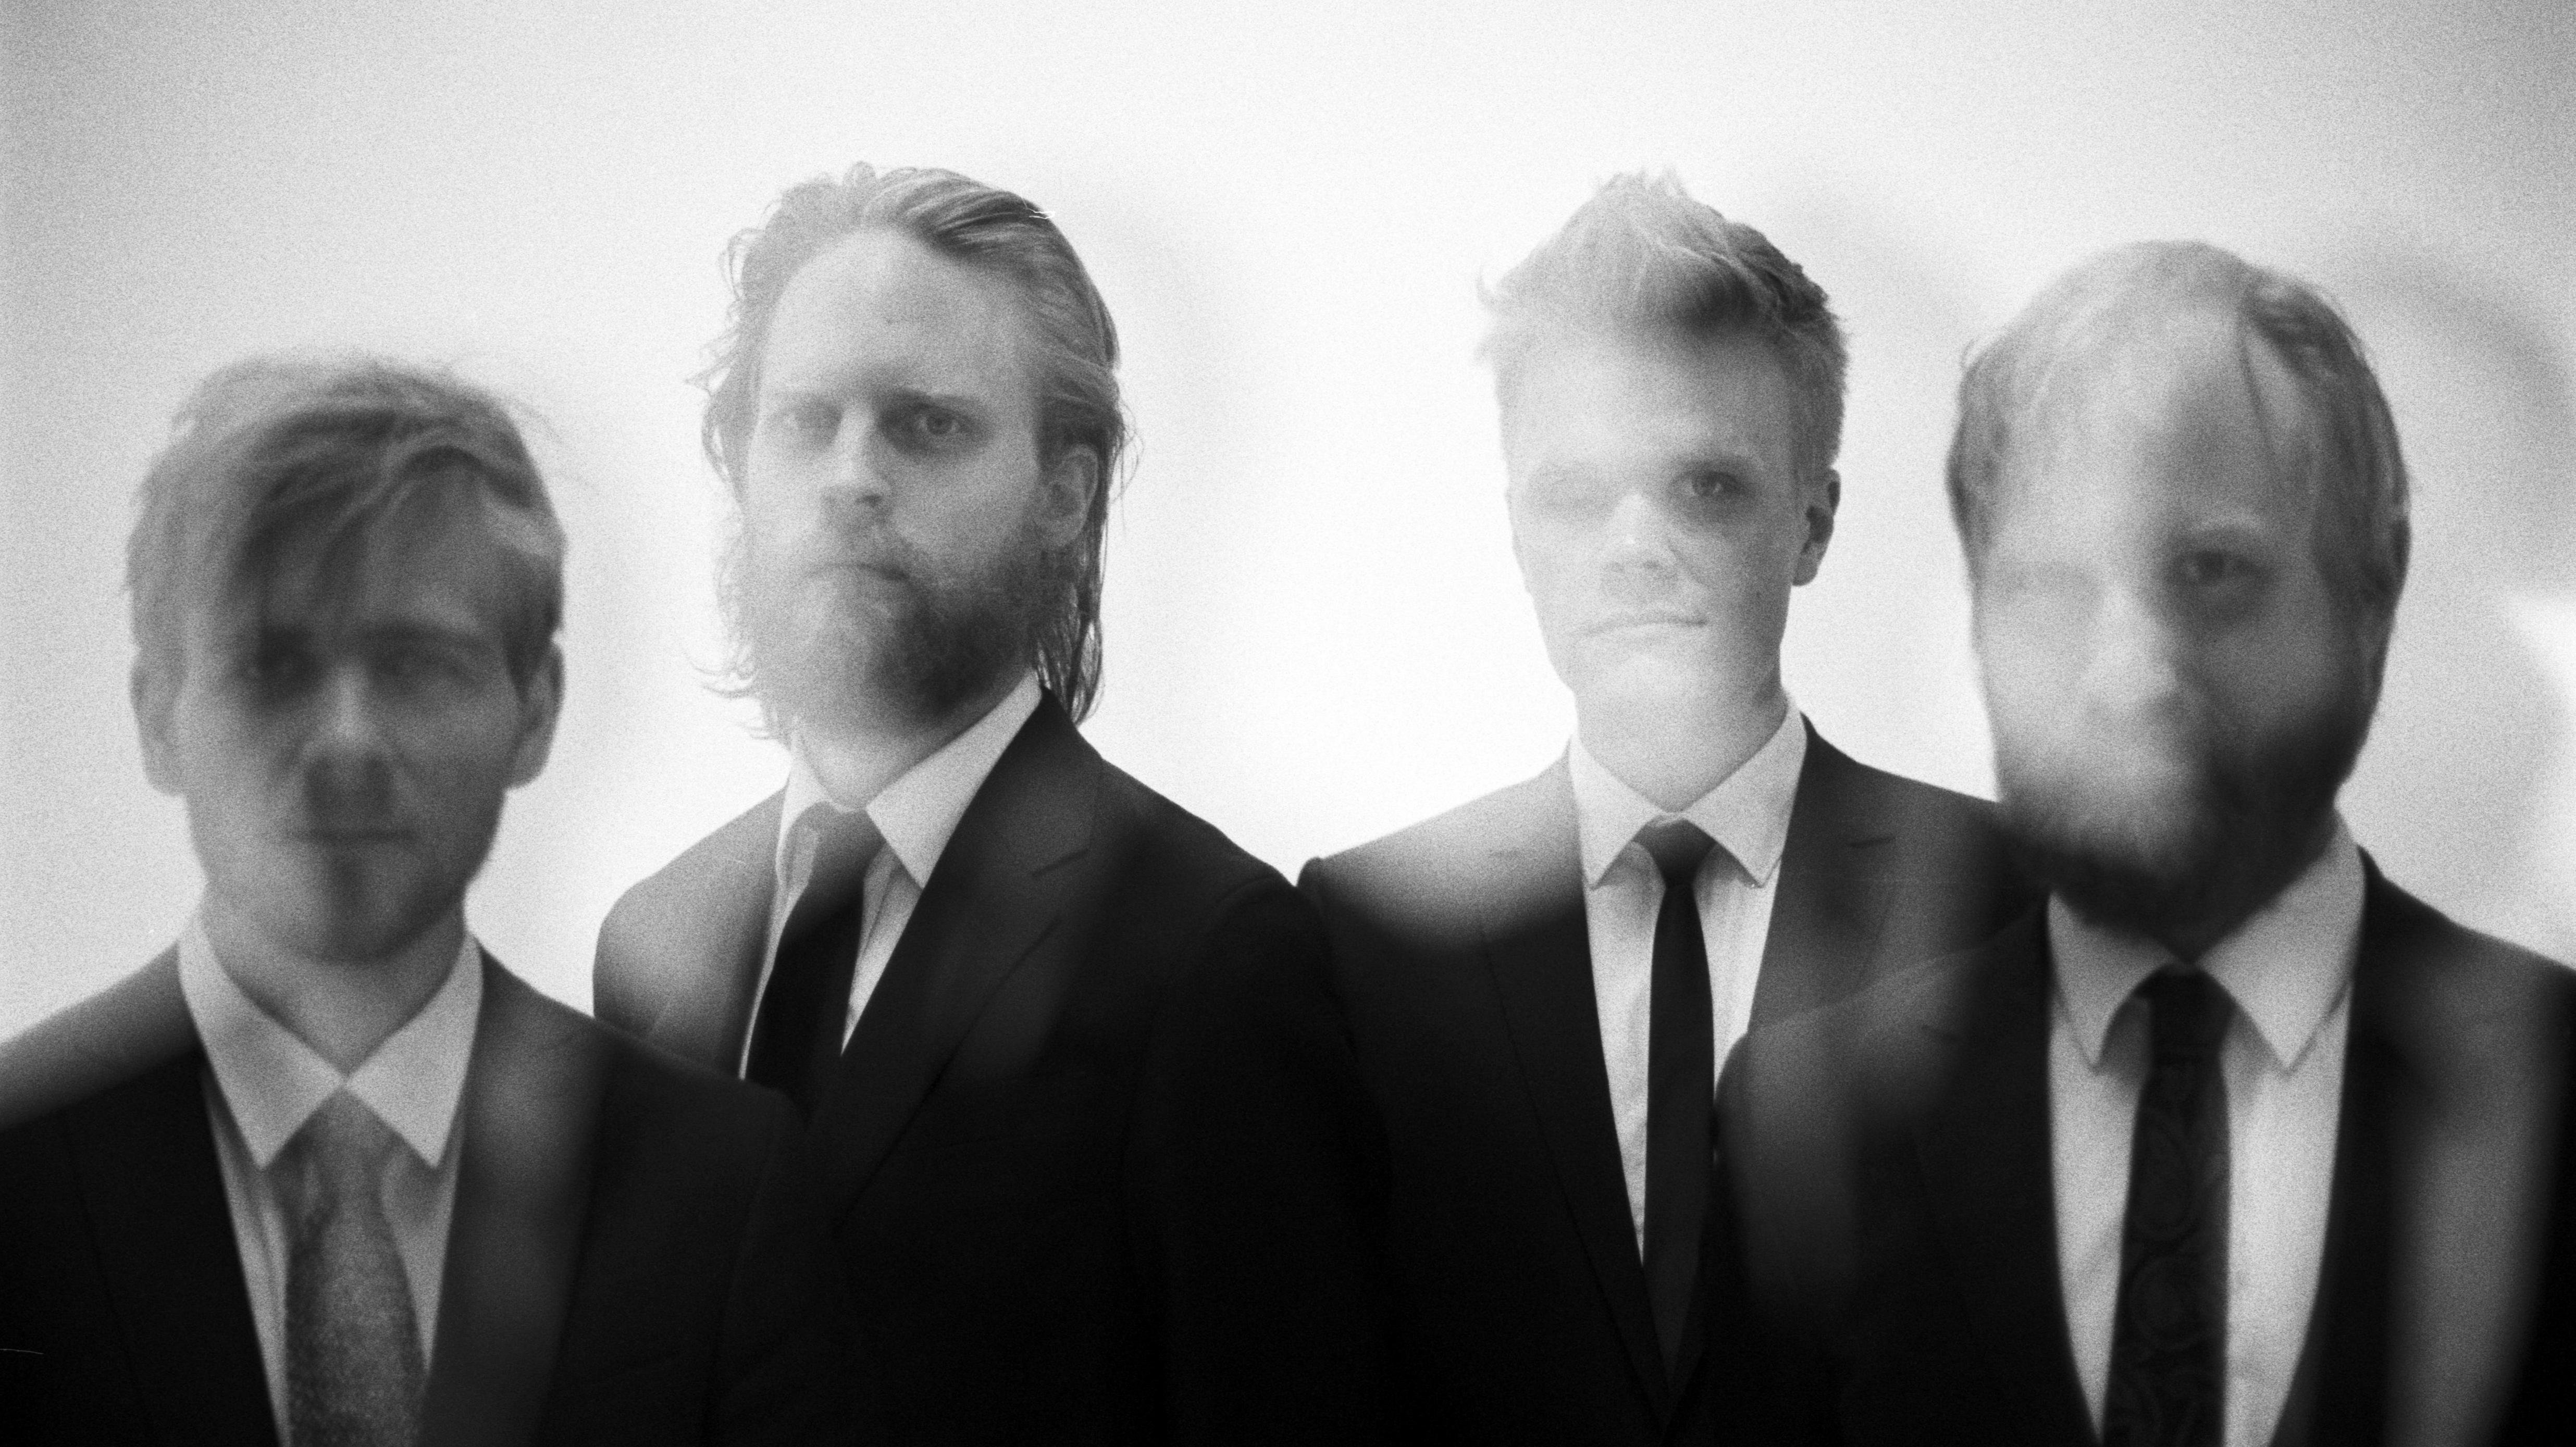 danish-quartet-by-caroline-bittencourt-002.jpg